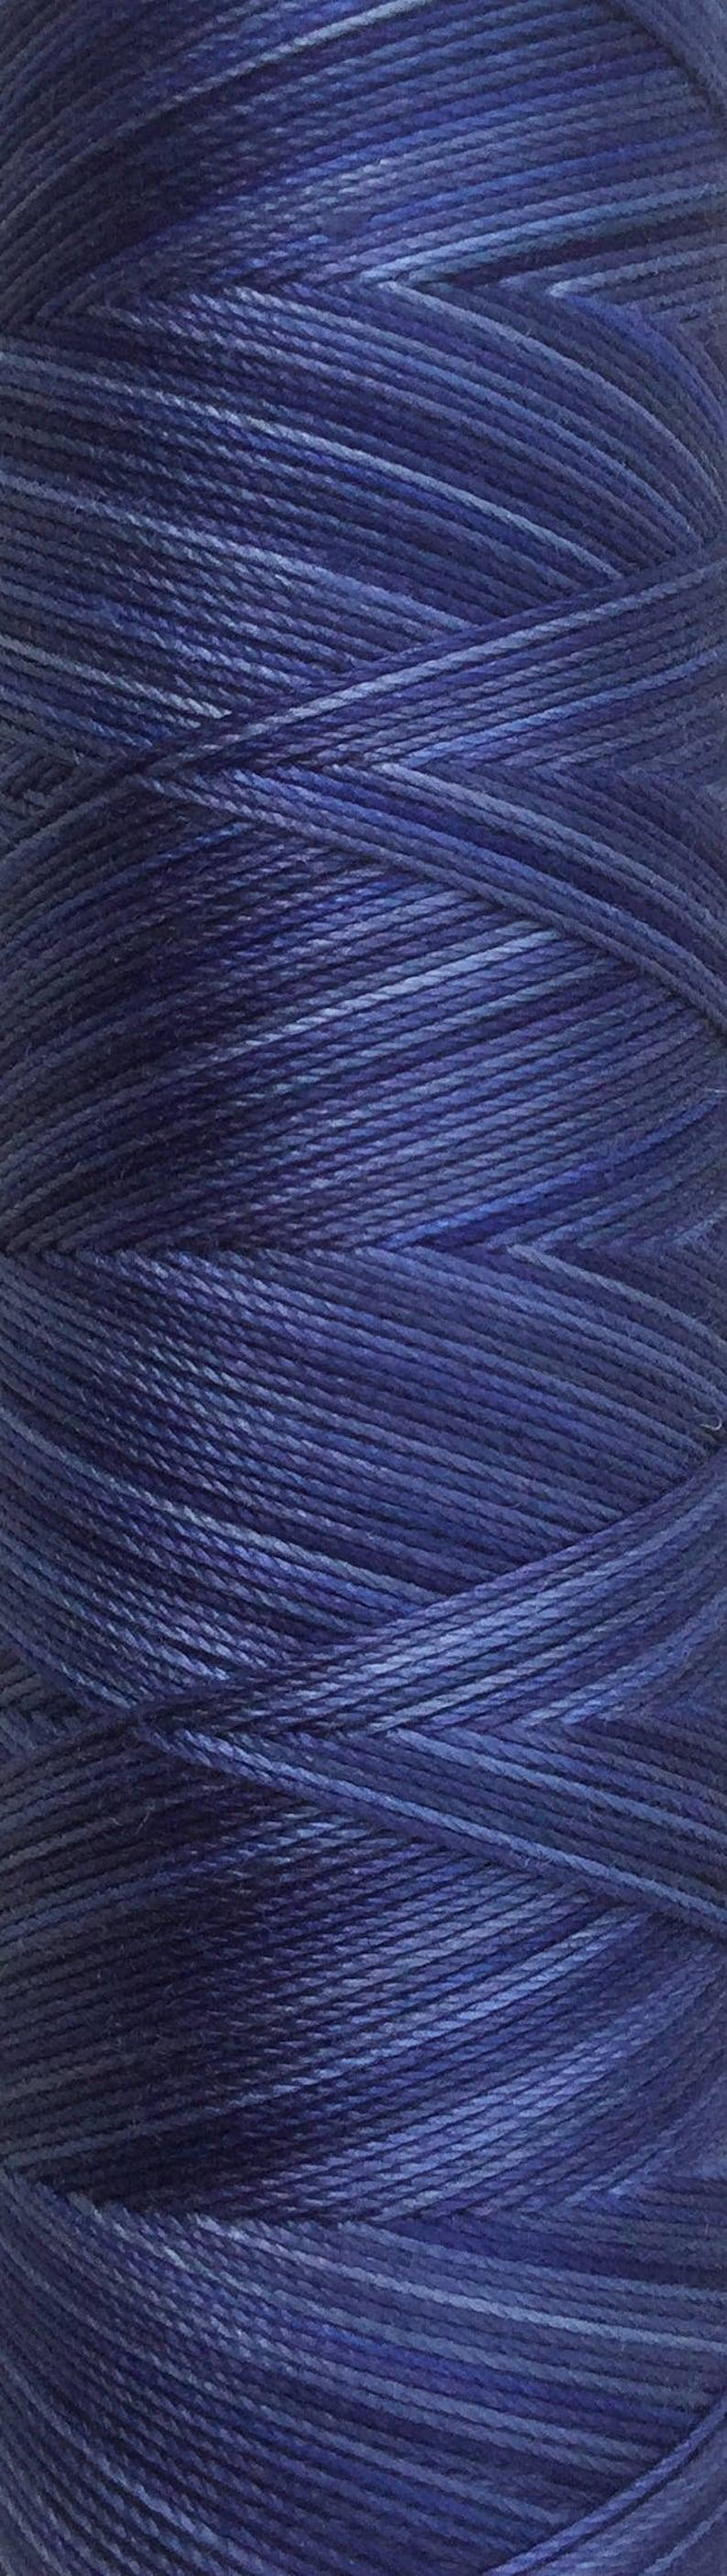 No.52 Ultramarine Hand Dyed Cotton Machine Thread Individual image 0